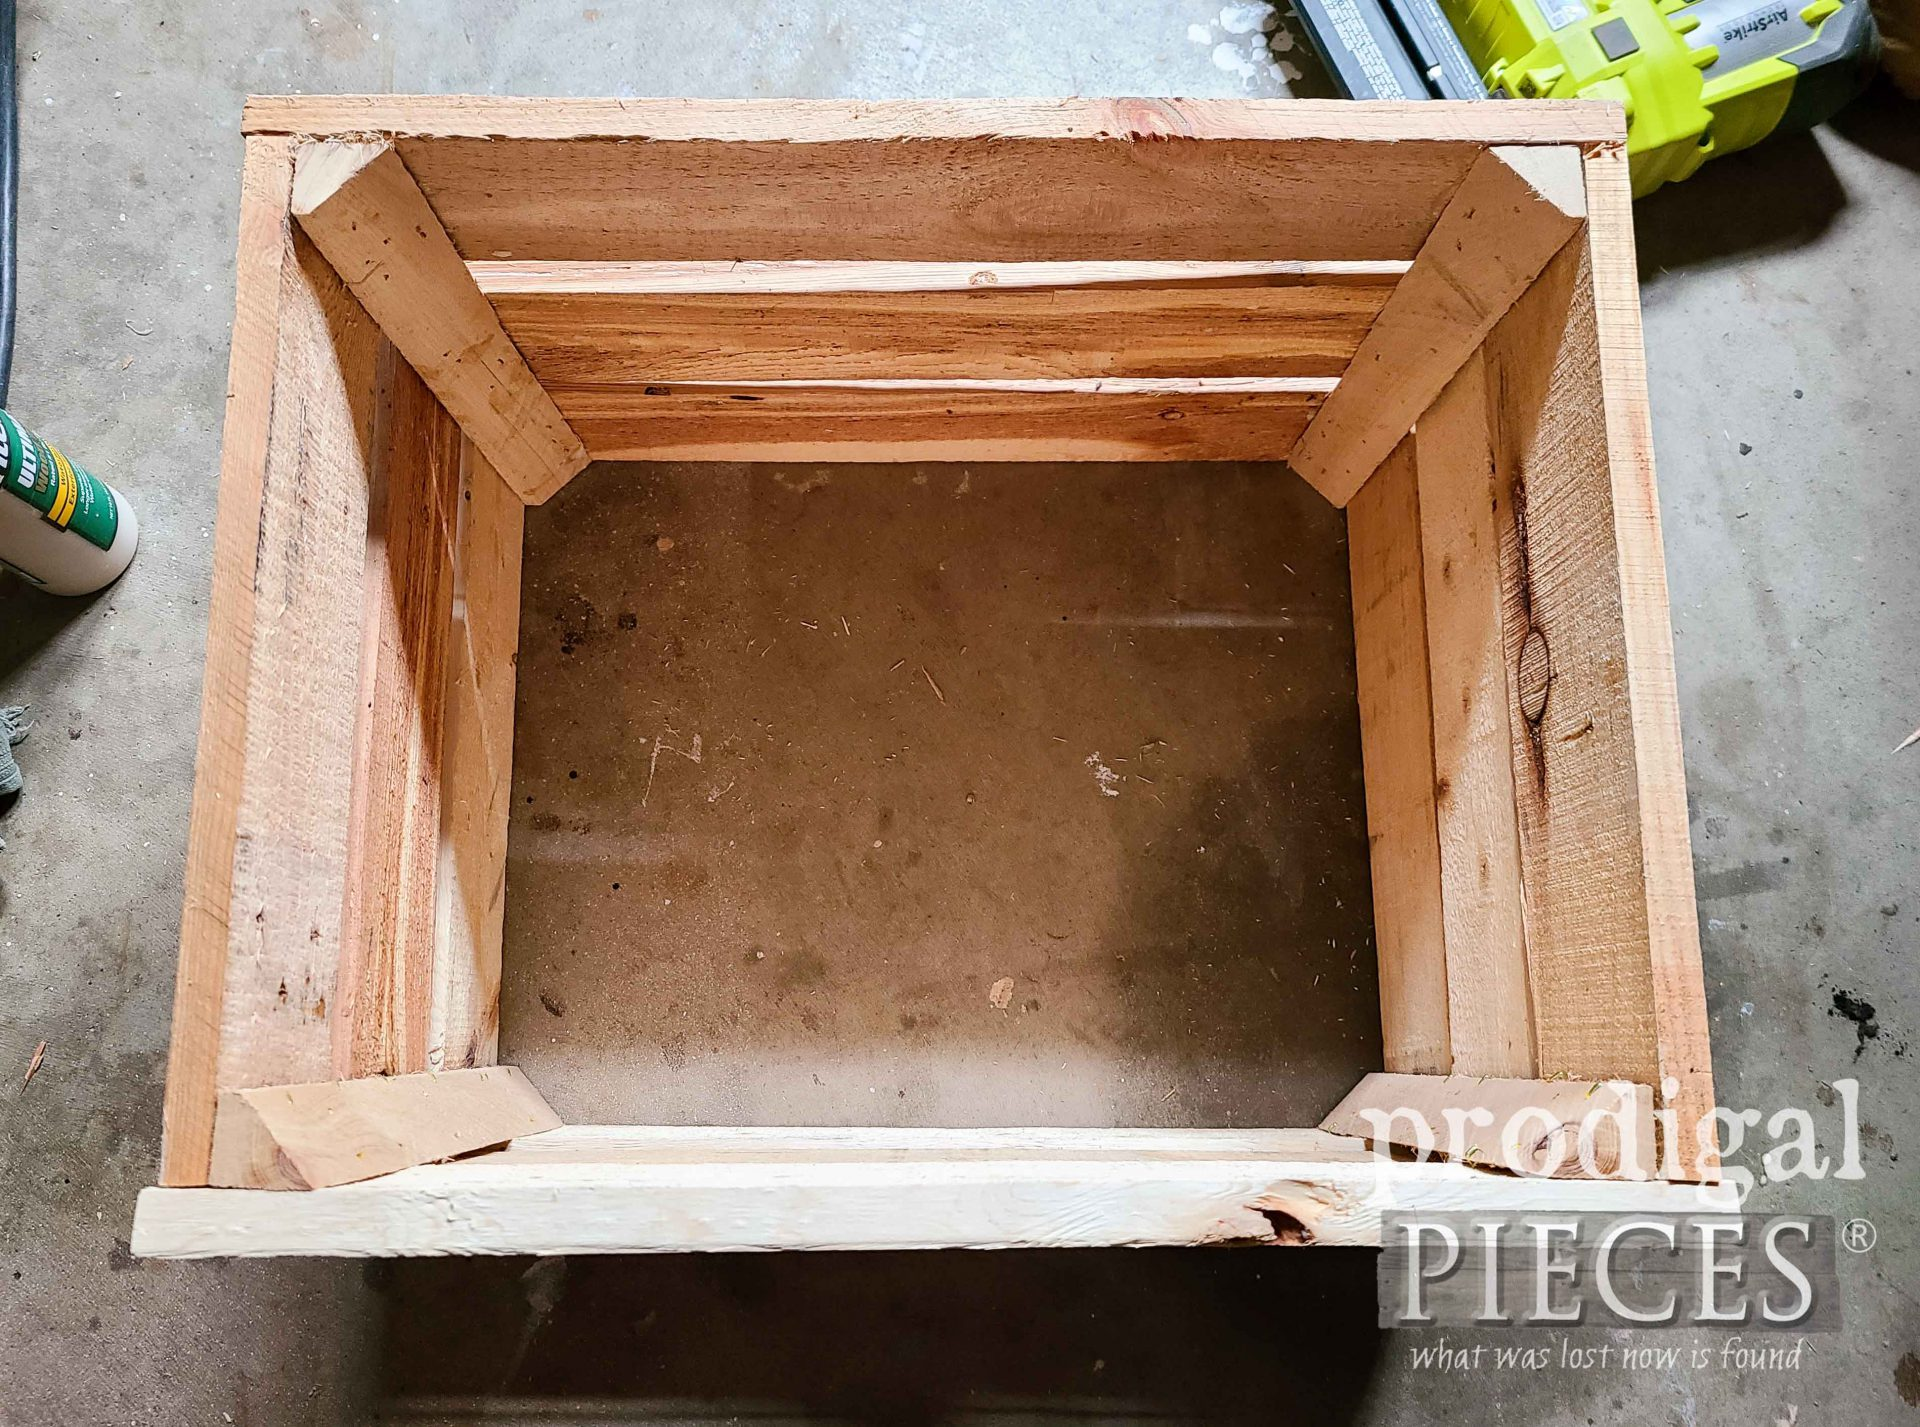 Partially Assembles DIY Crate for Farmhouse Decor by Larissa of Prodigal Pieces | prodigalpieces.com #prodigalpieces